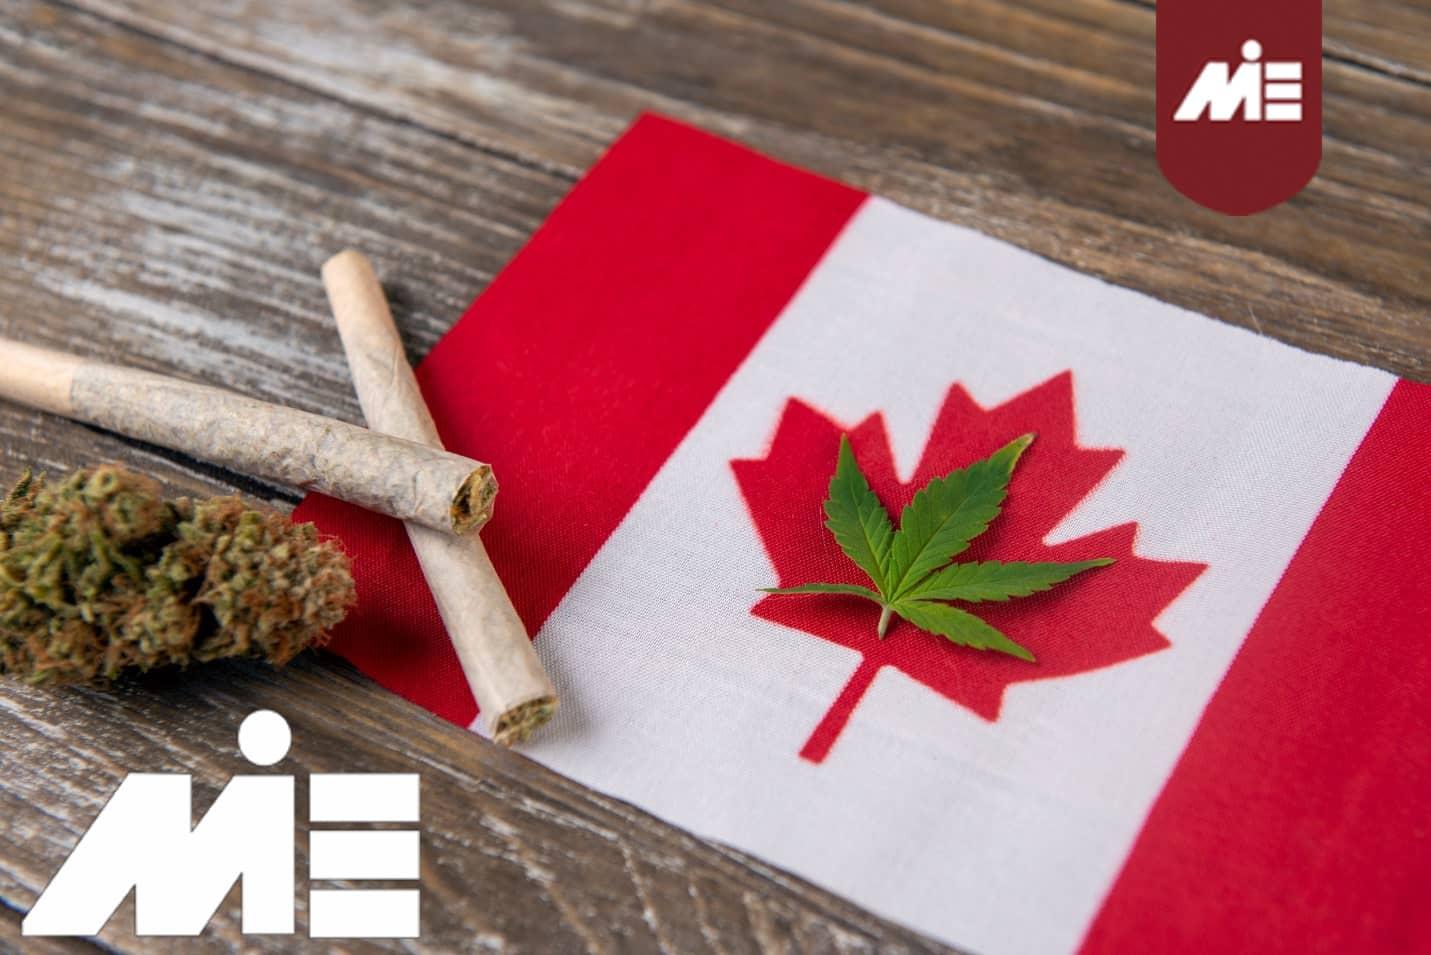 اخذ اقامت دائم کانادا - اخذ اقامت دائم کانادا برای هنرمندان و افراد فوق موفق